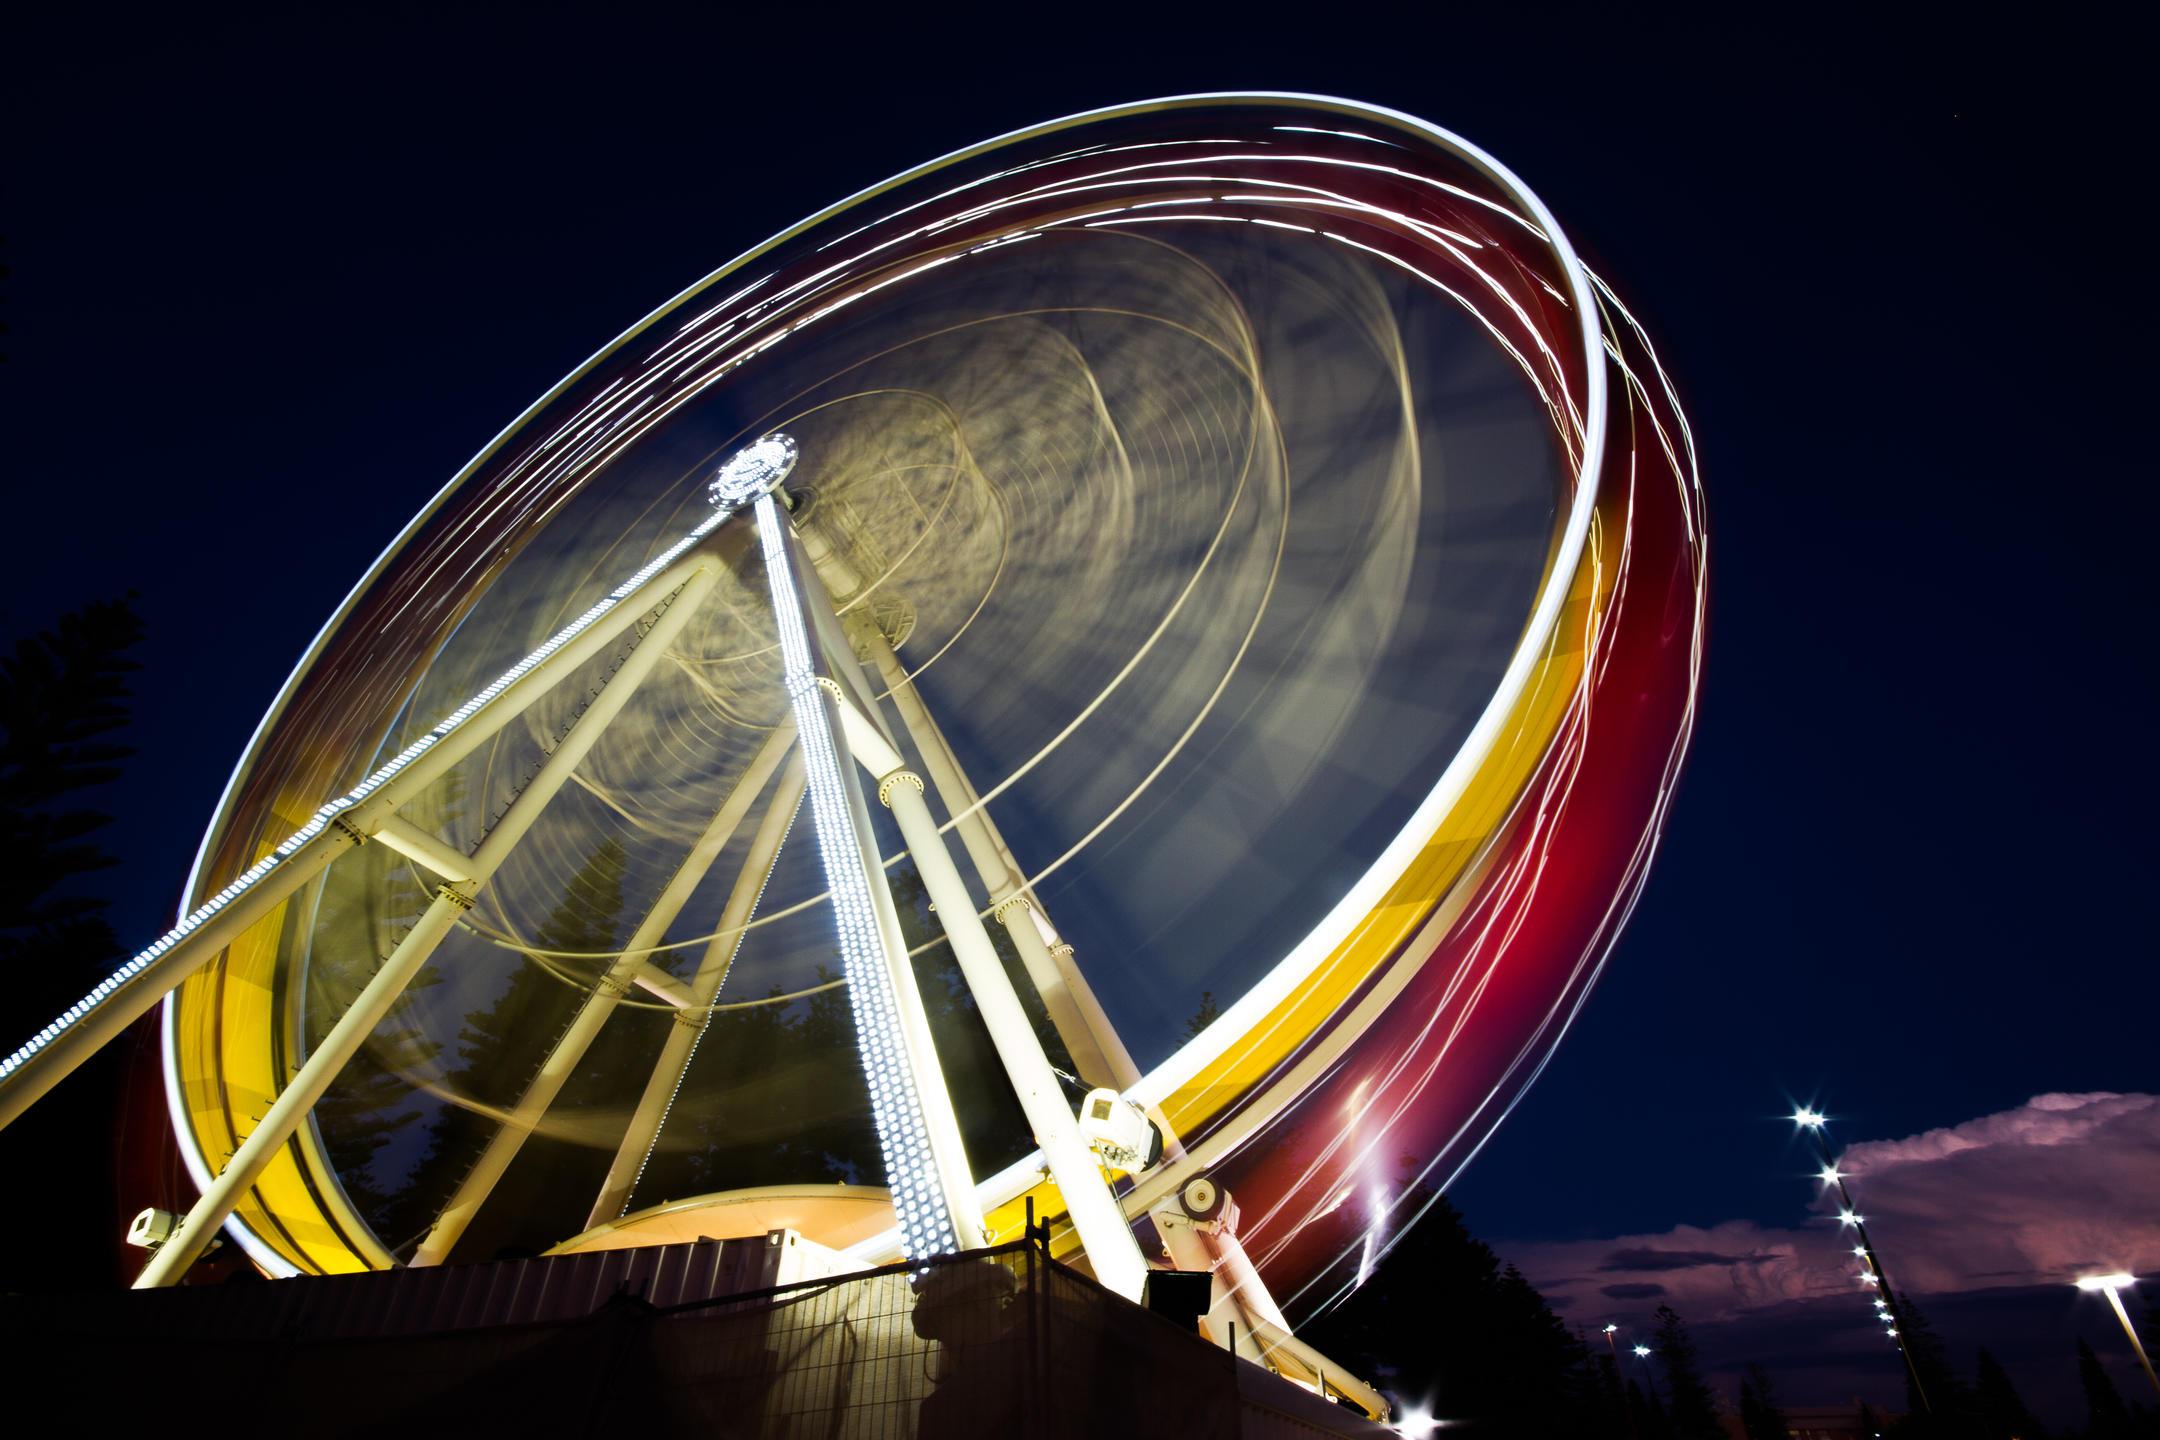 Long exposure of a ferris wheel